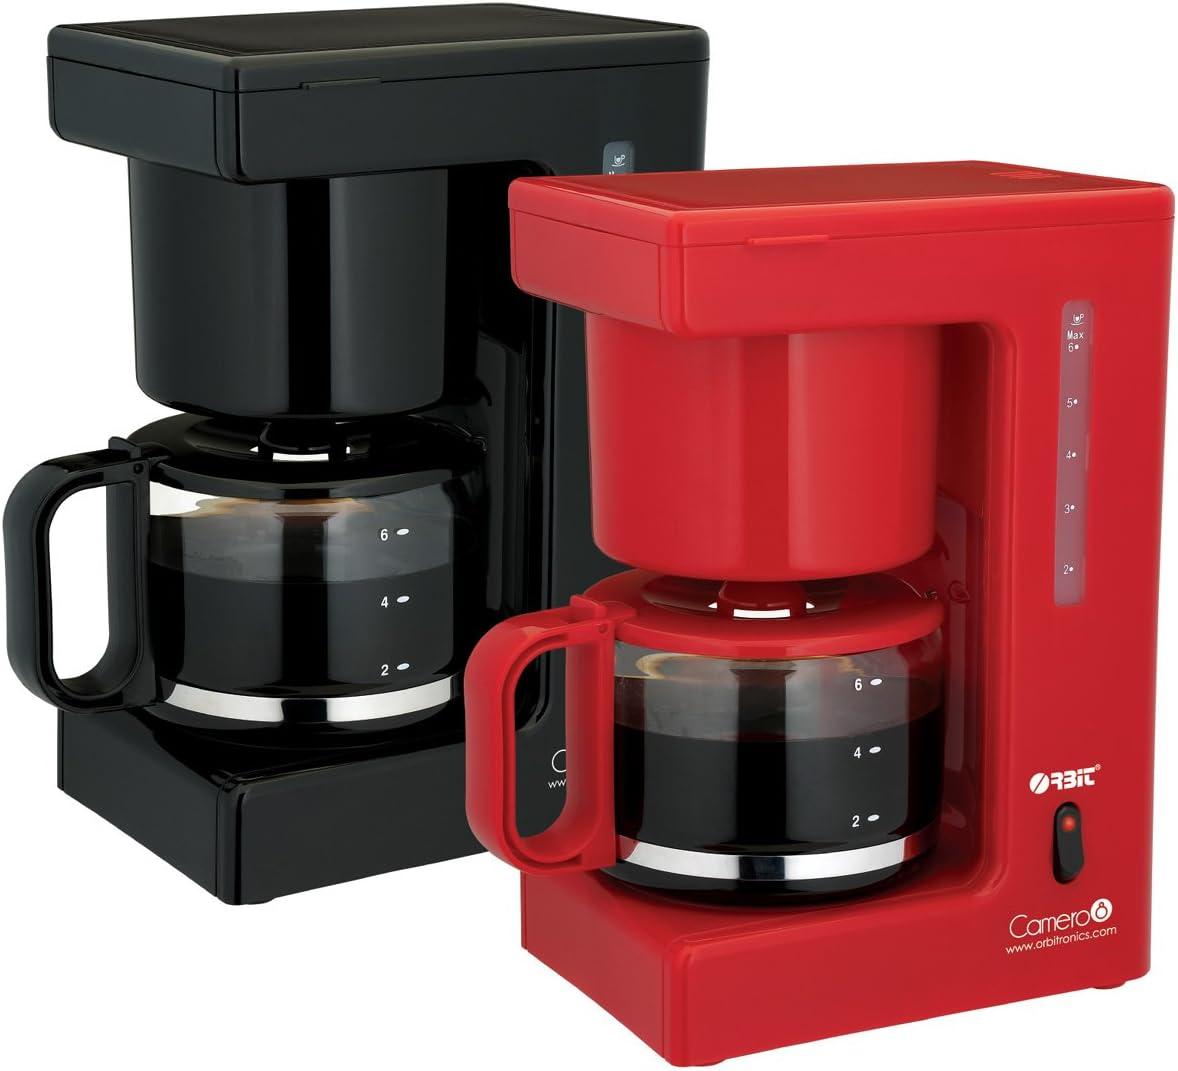 ORBIT Cafetera Eléctrica 680W Roja: Amazon.es: Hogar